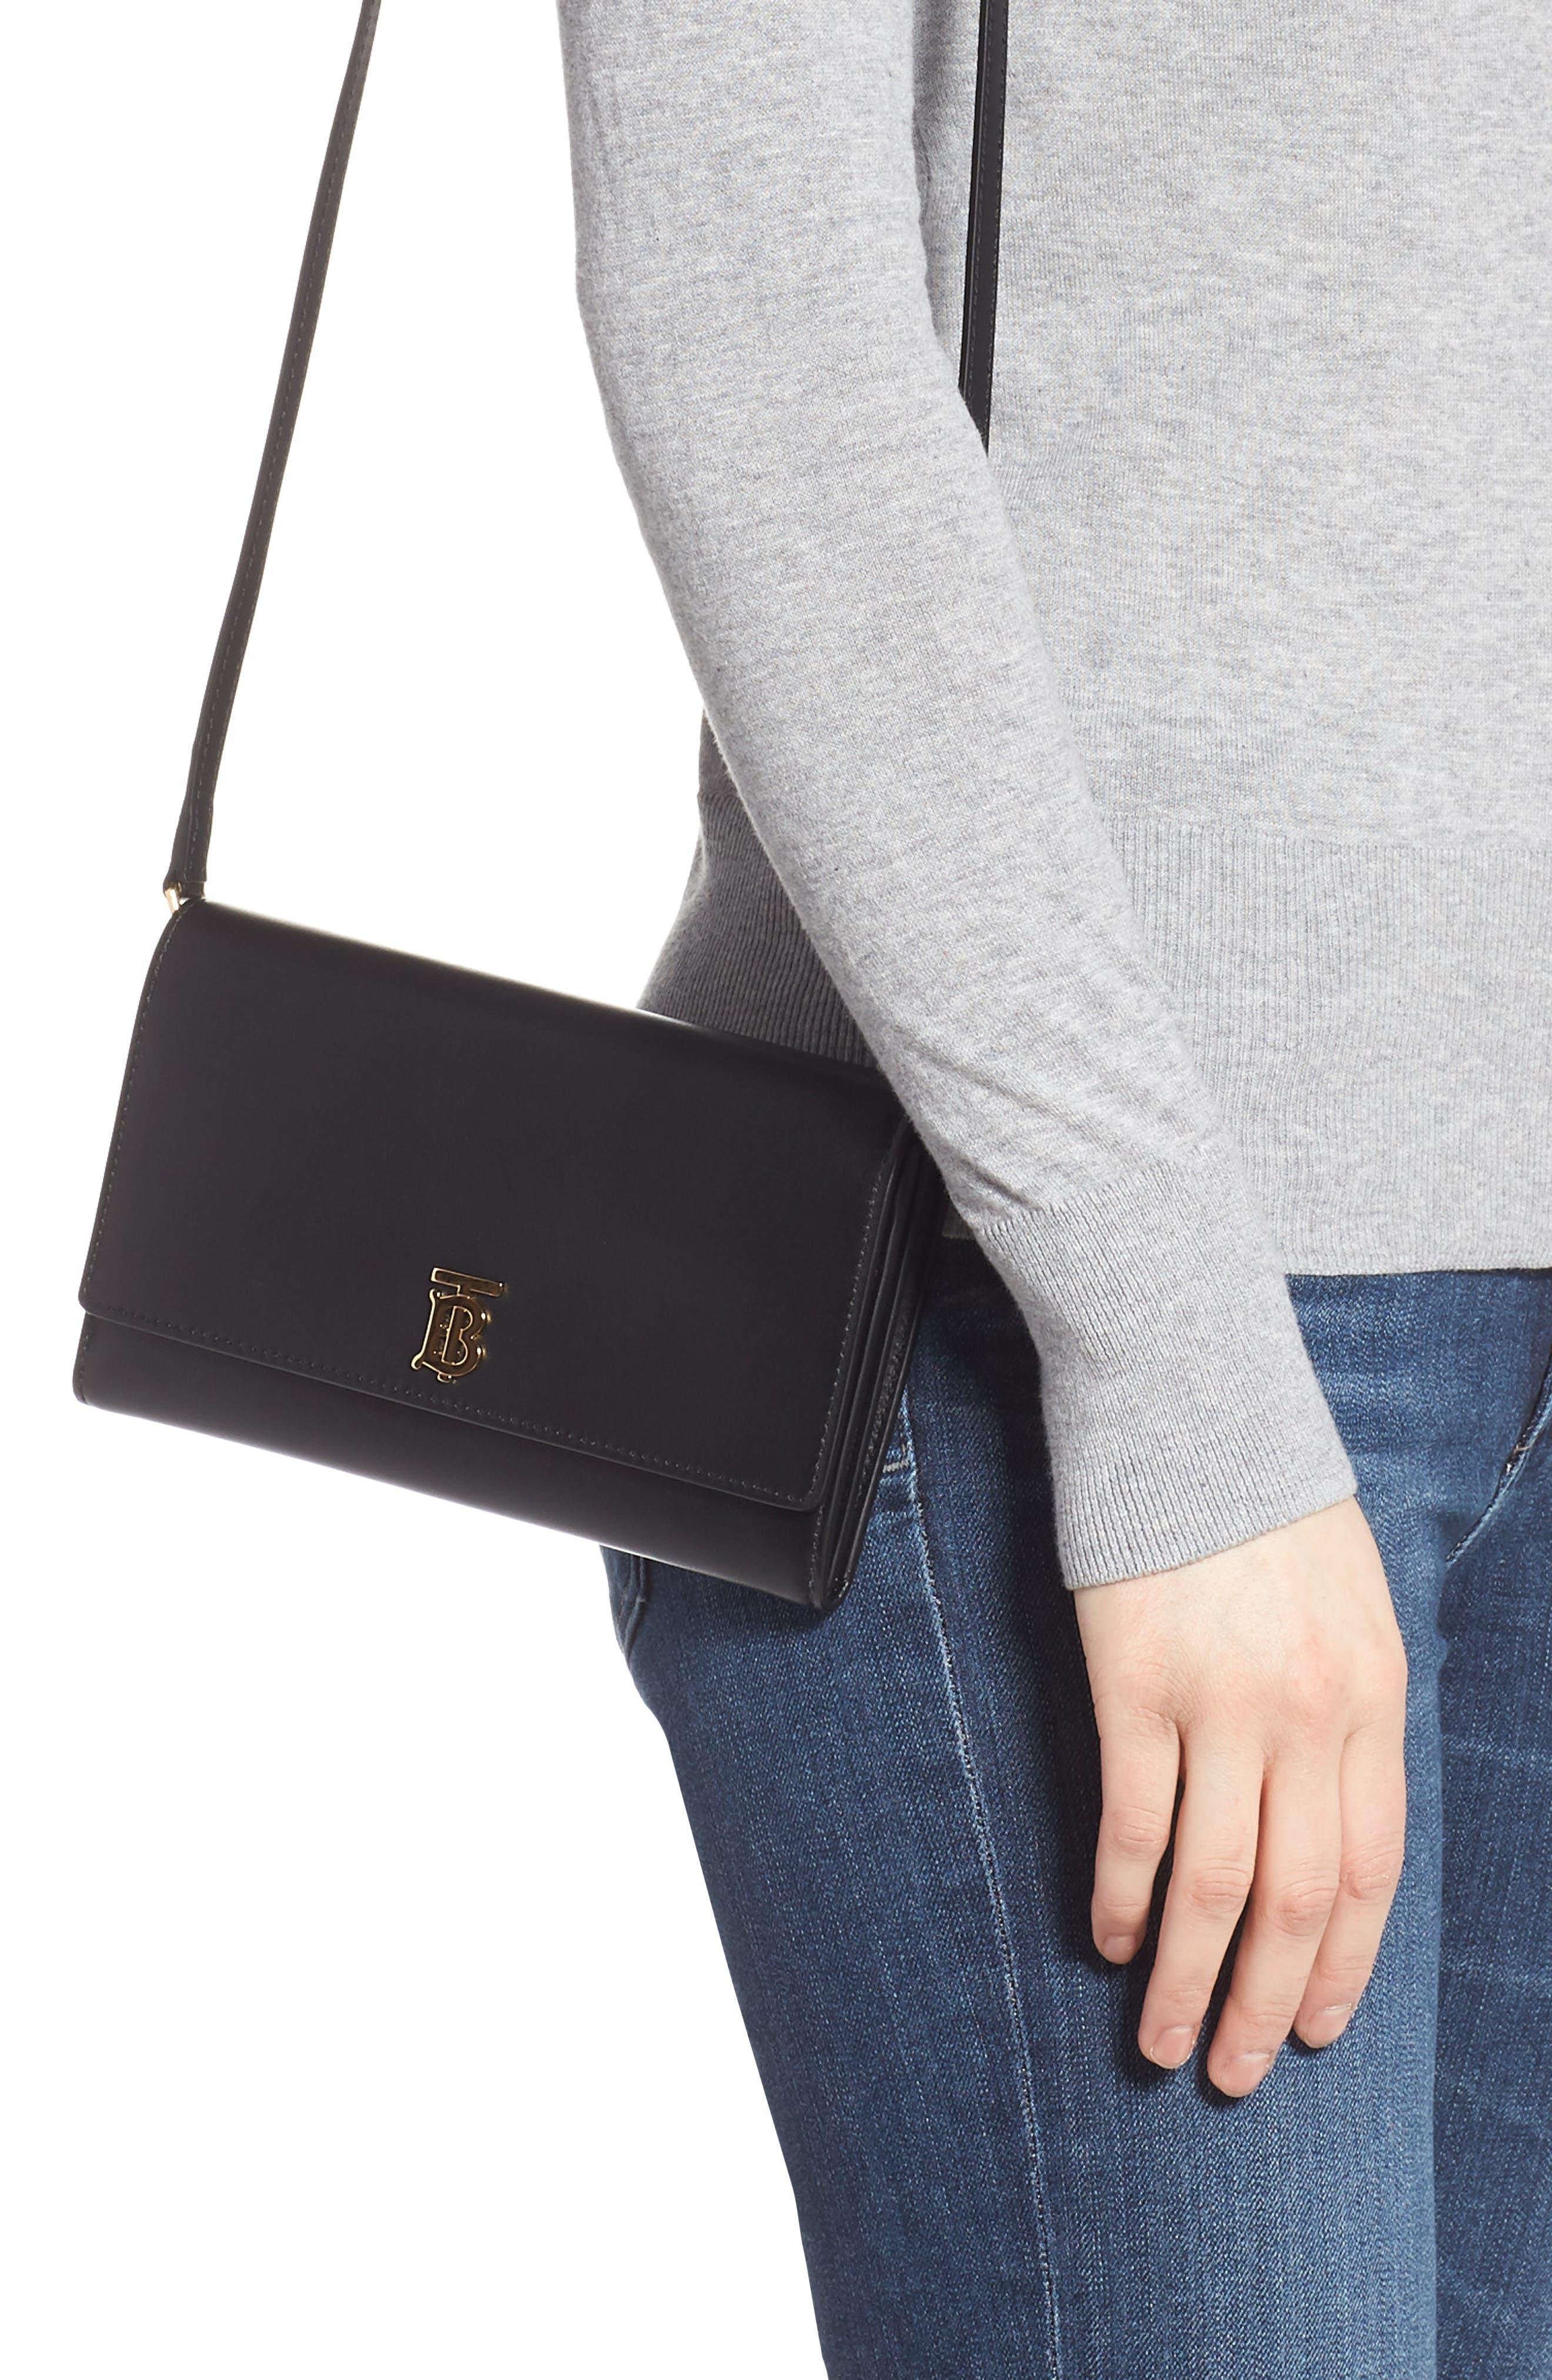 BURBERRY,                             Hazelmere Leather Crossbody Wallet,                             Alternate thumbnail 2, color,                             BLACK